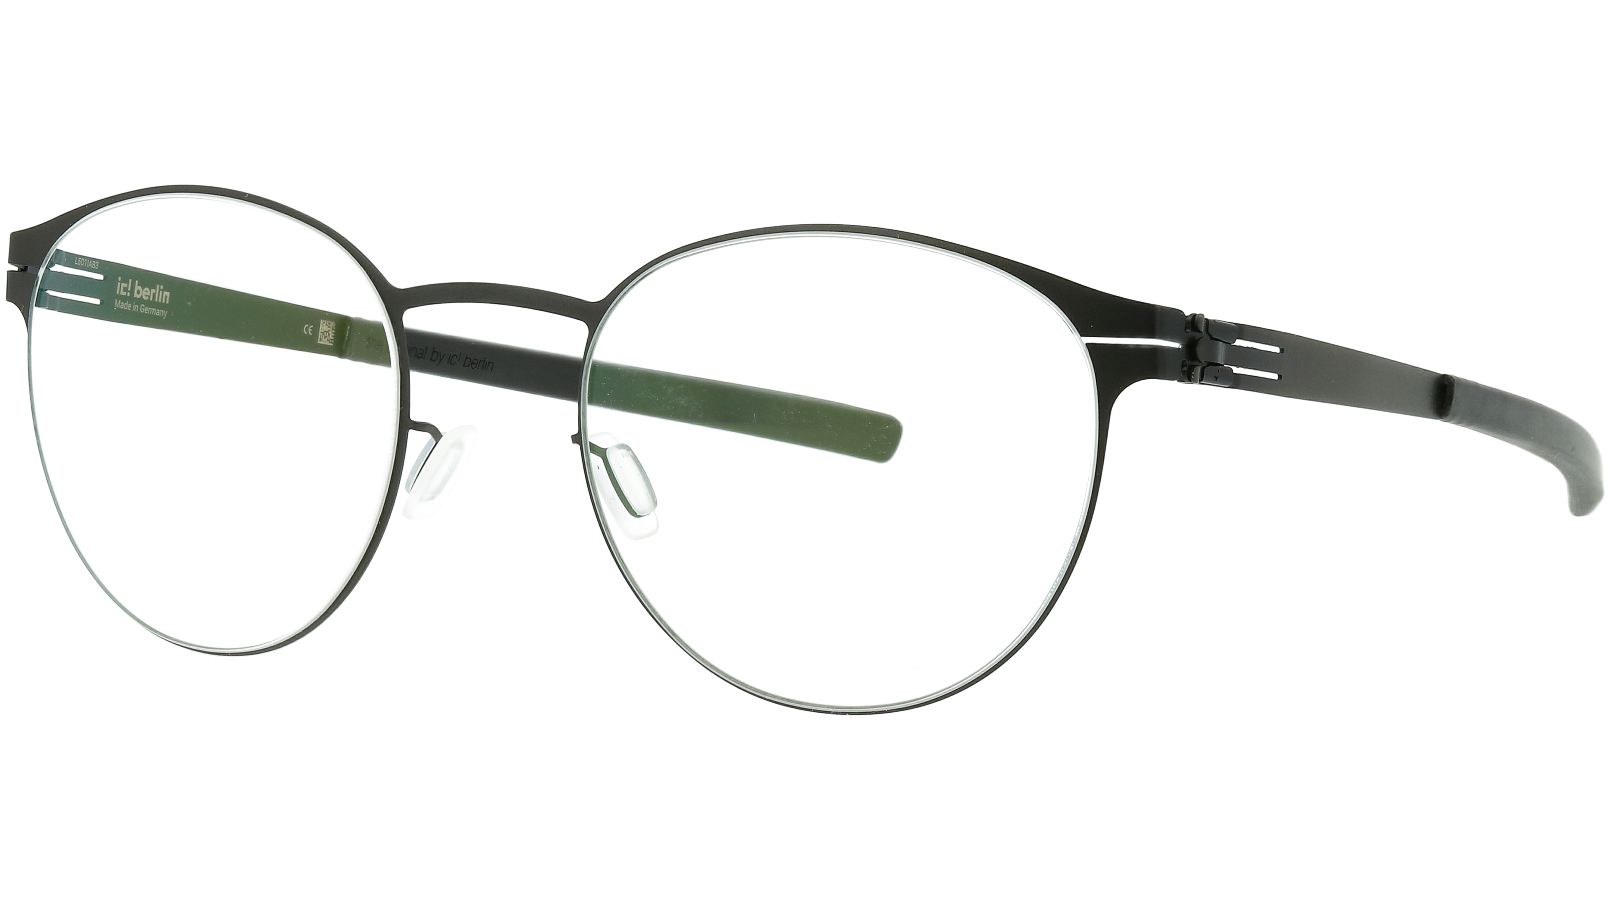 ic! Berlin James C. Black 50 Flex Glasses